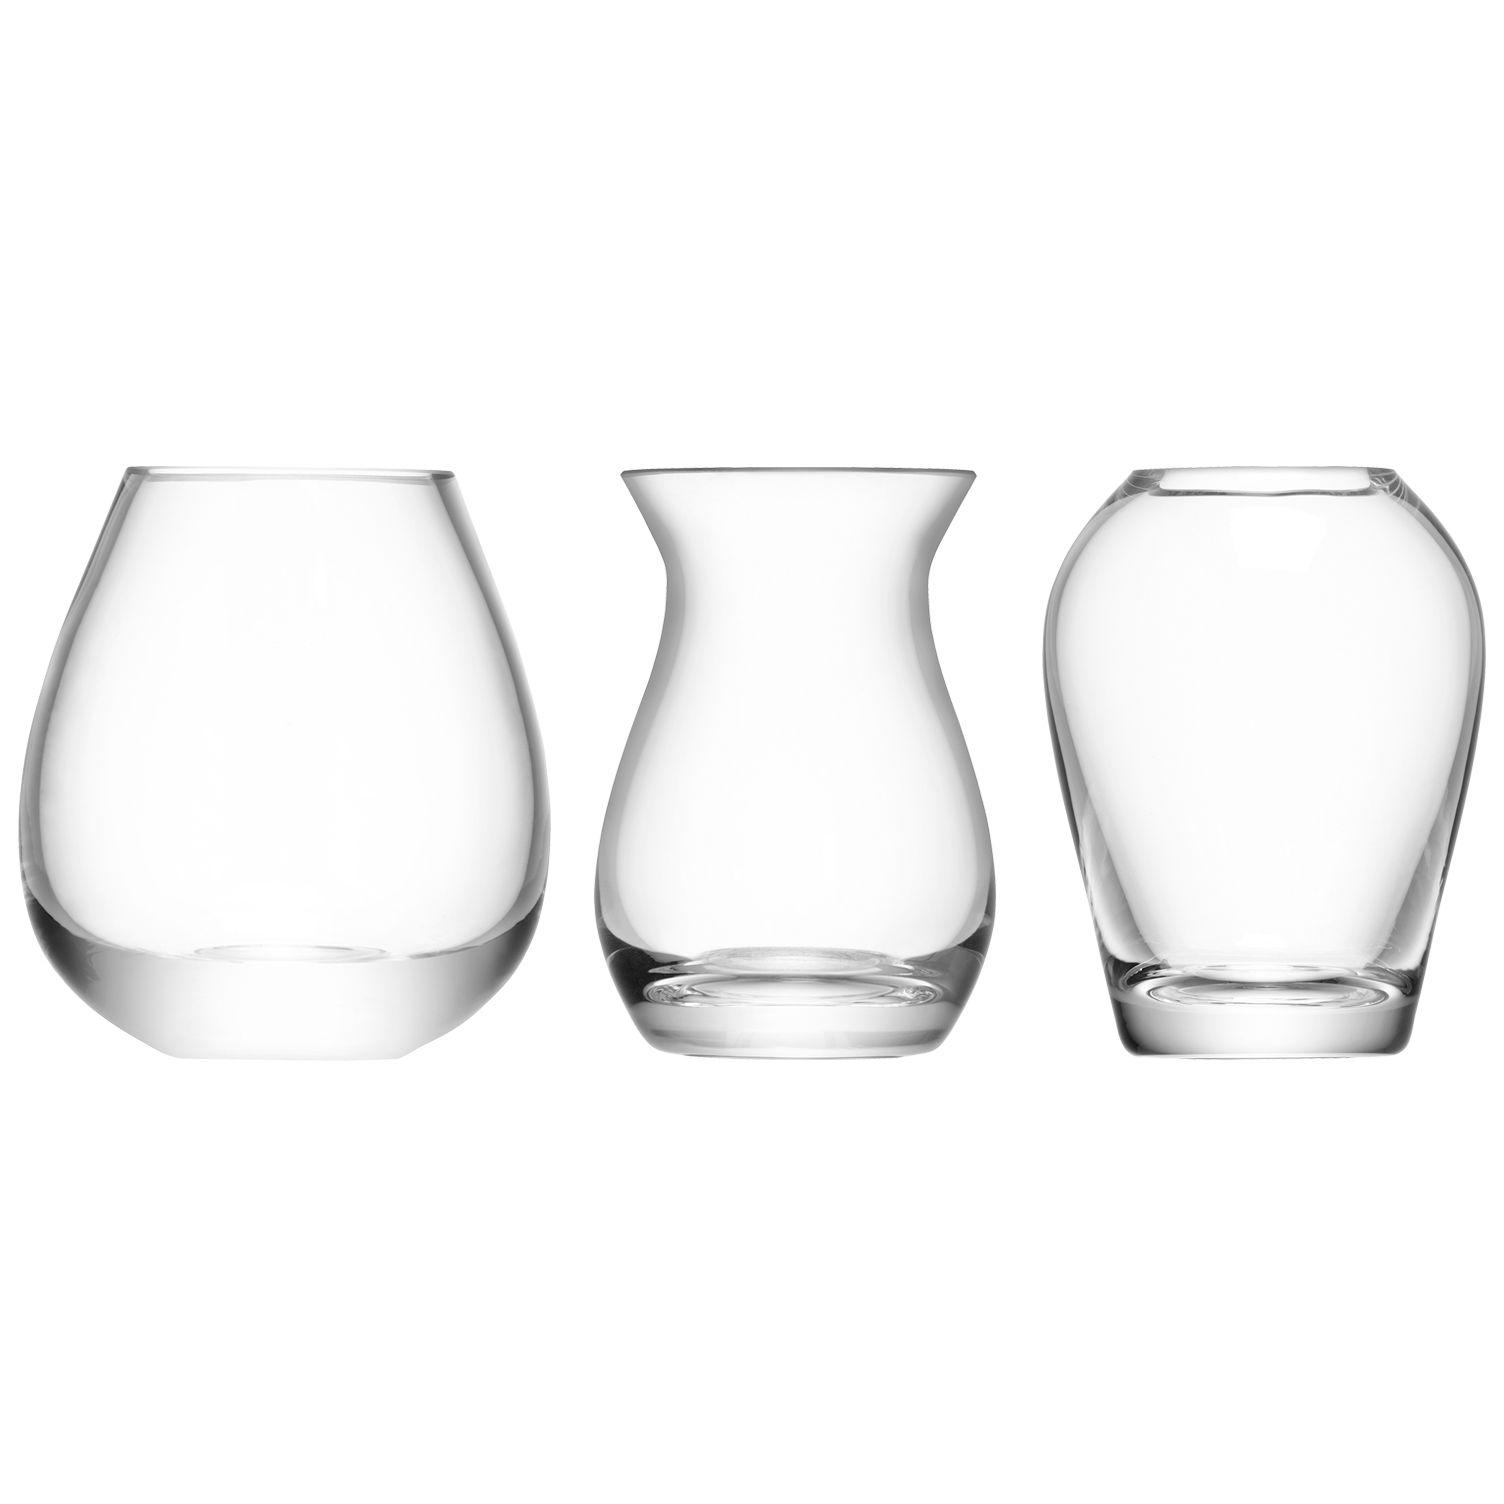 LSA International LSA International Flower Mini Vase Gift Set, Set of 3